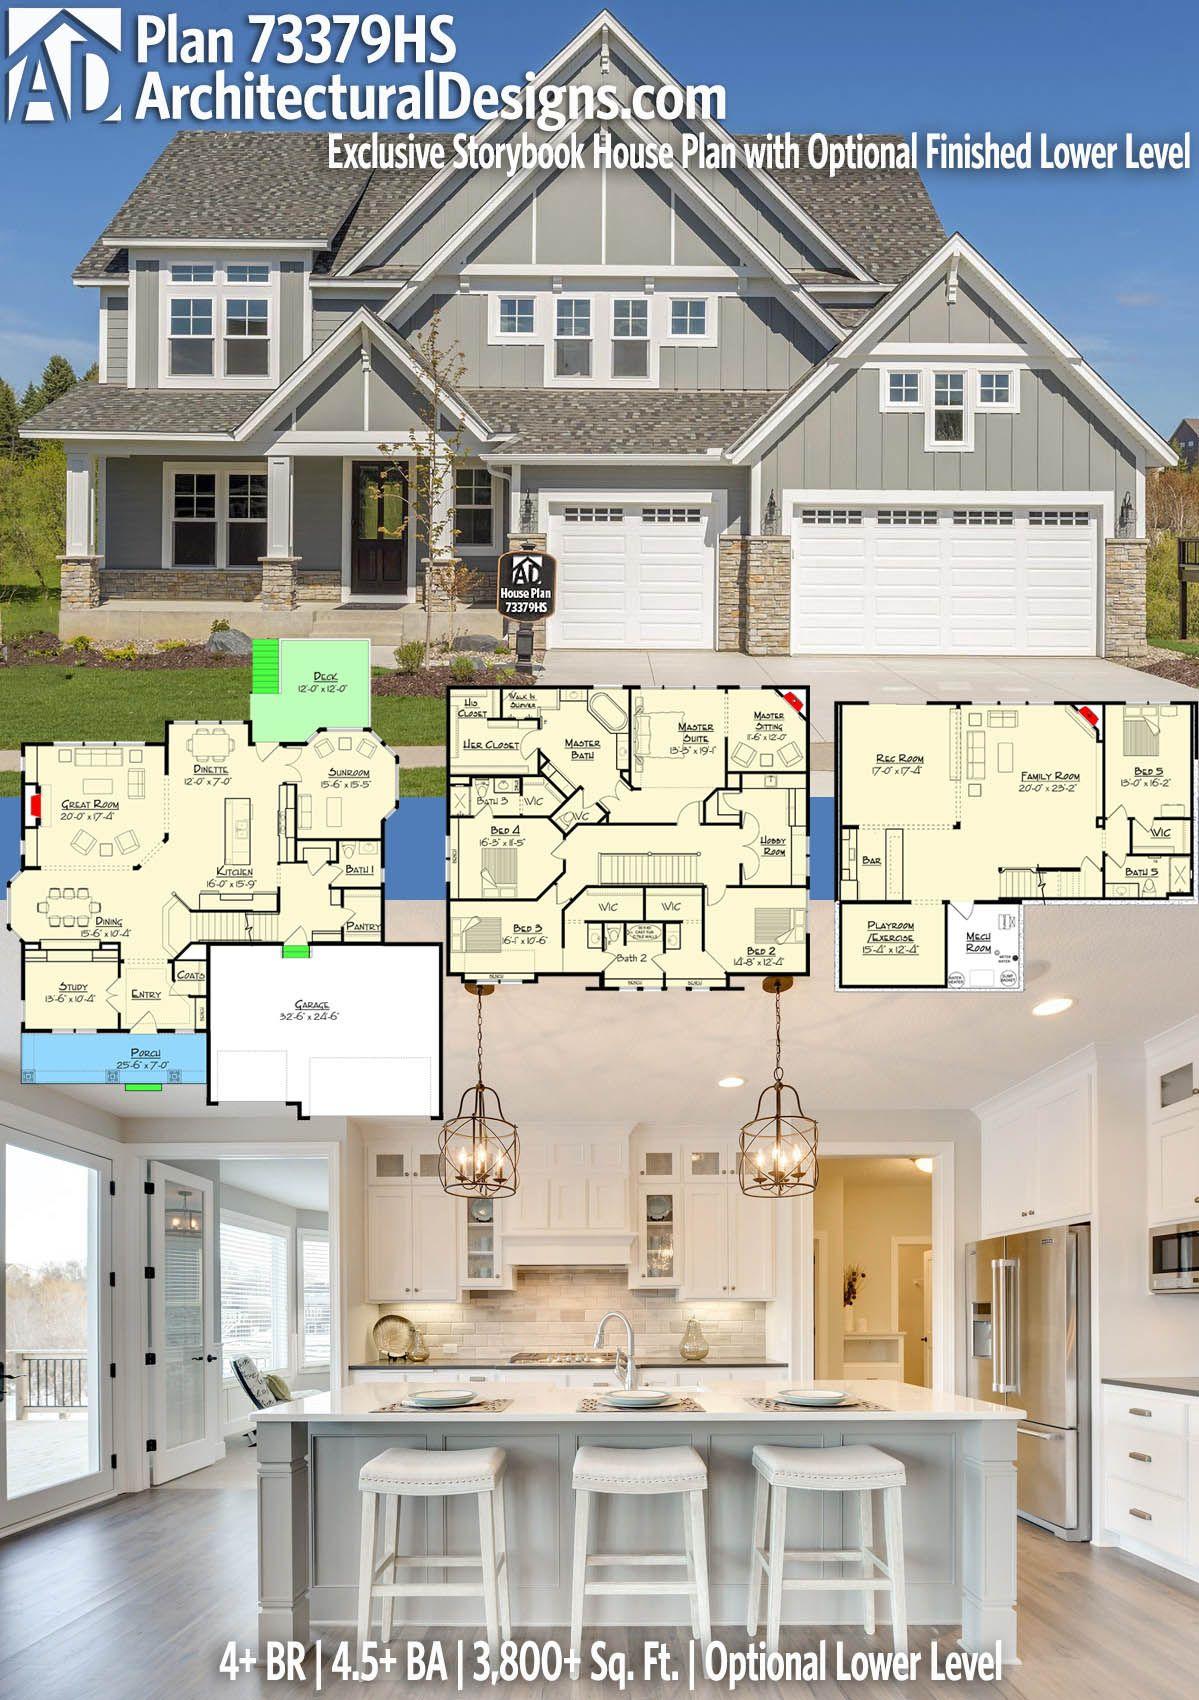 Architectural Designs Exclusive House Plan 73379HS has